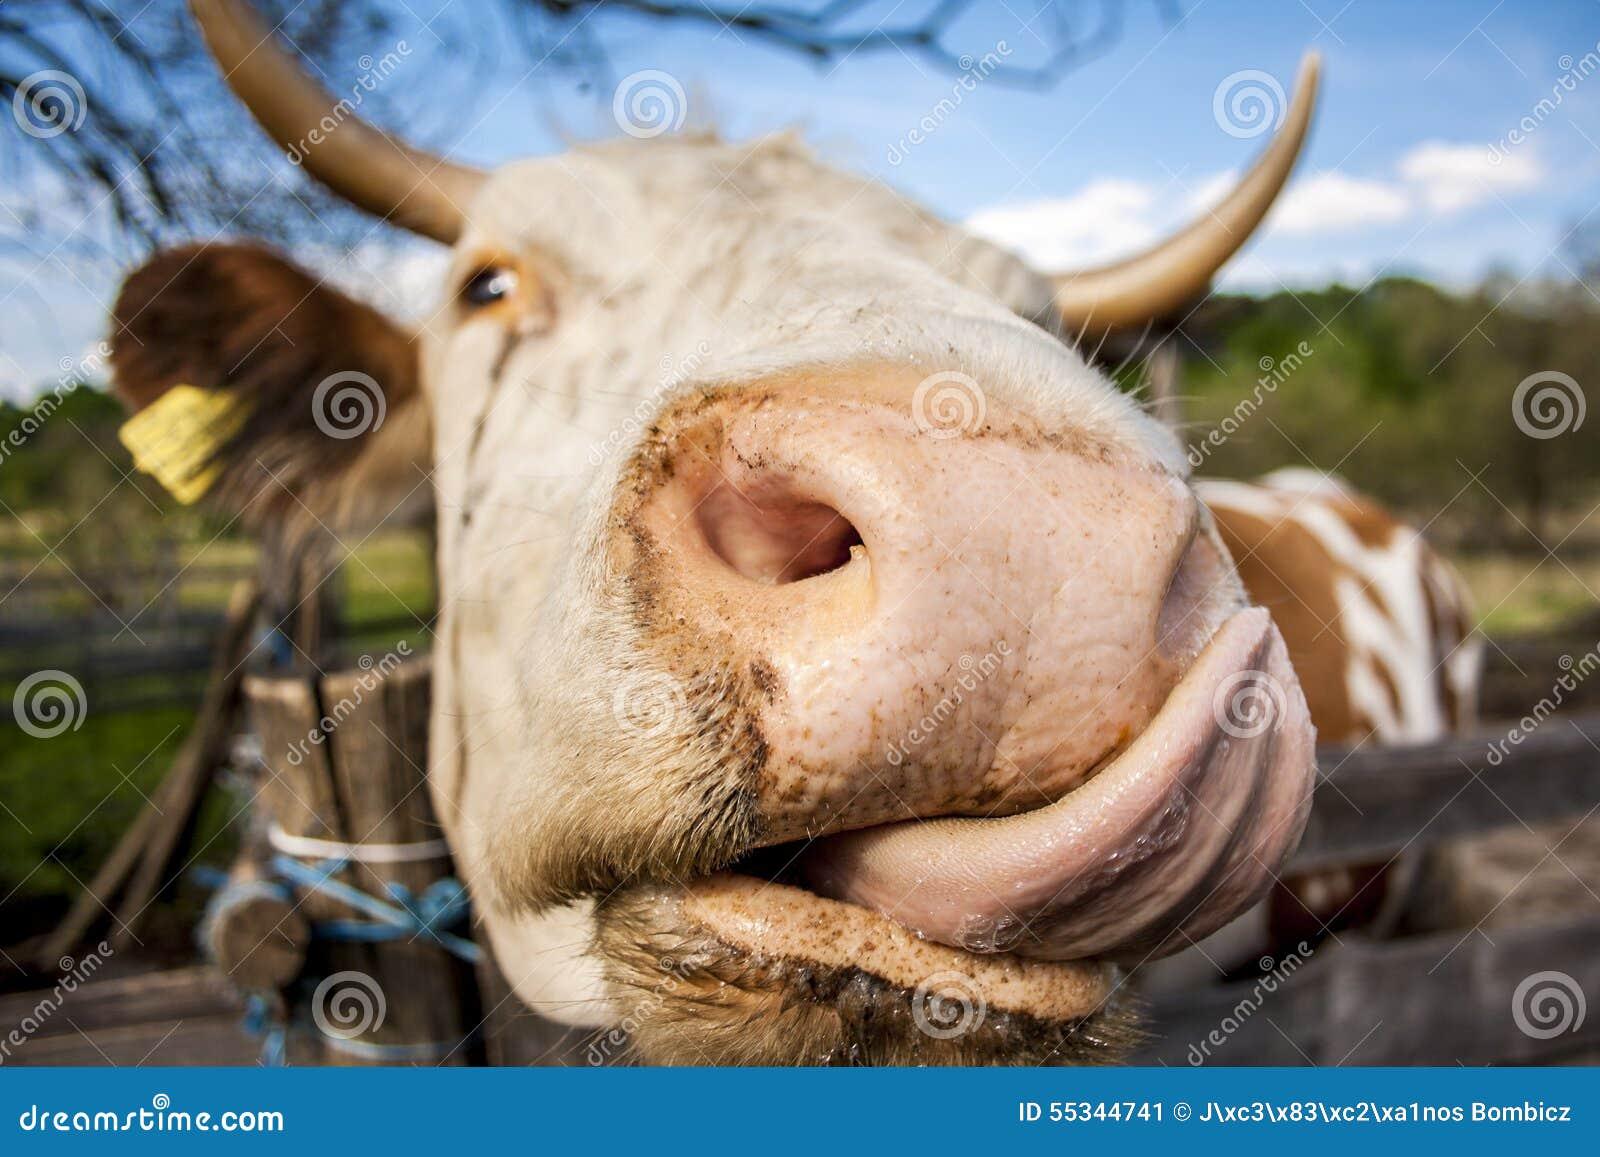 Risultati immagini per leccata di mucca